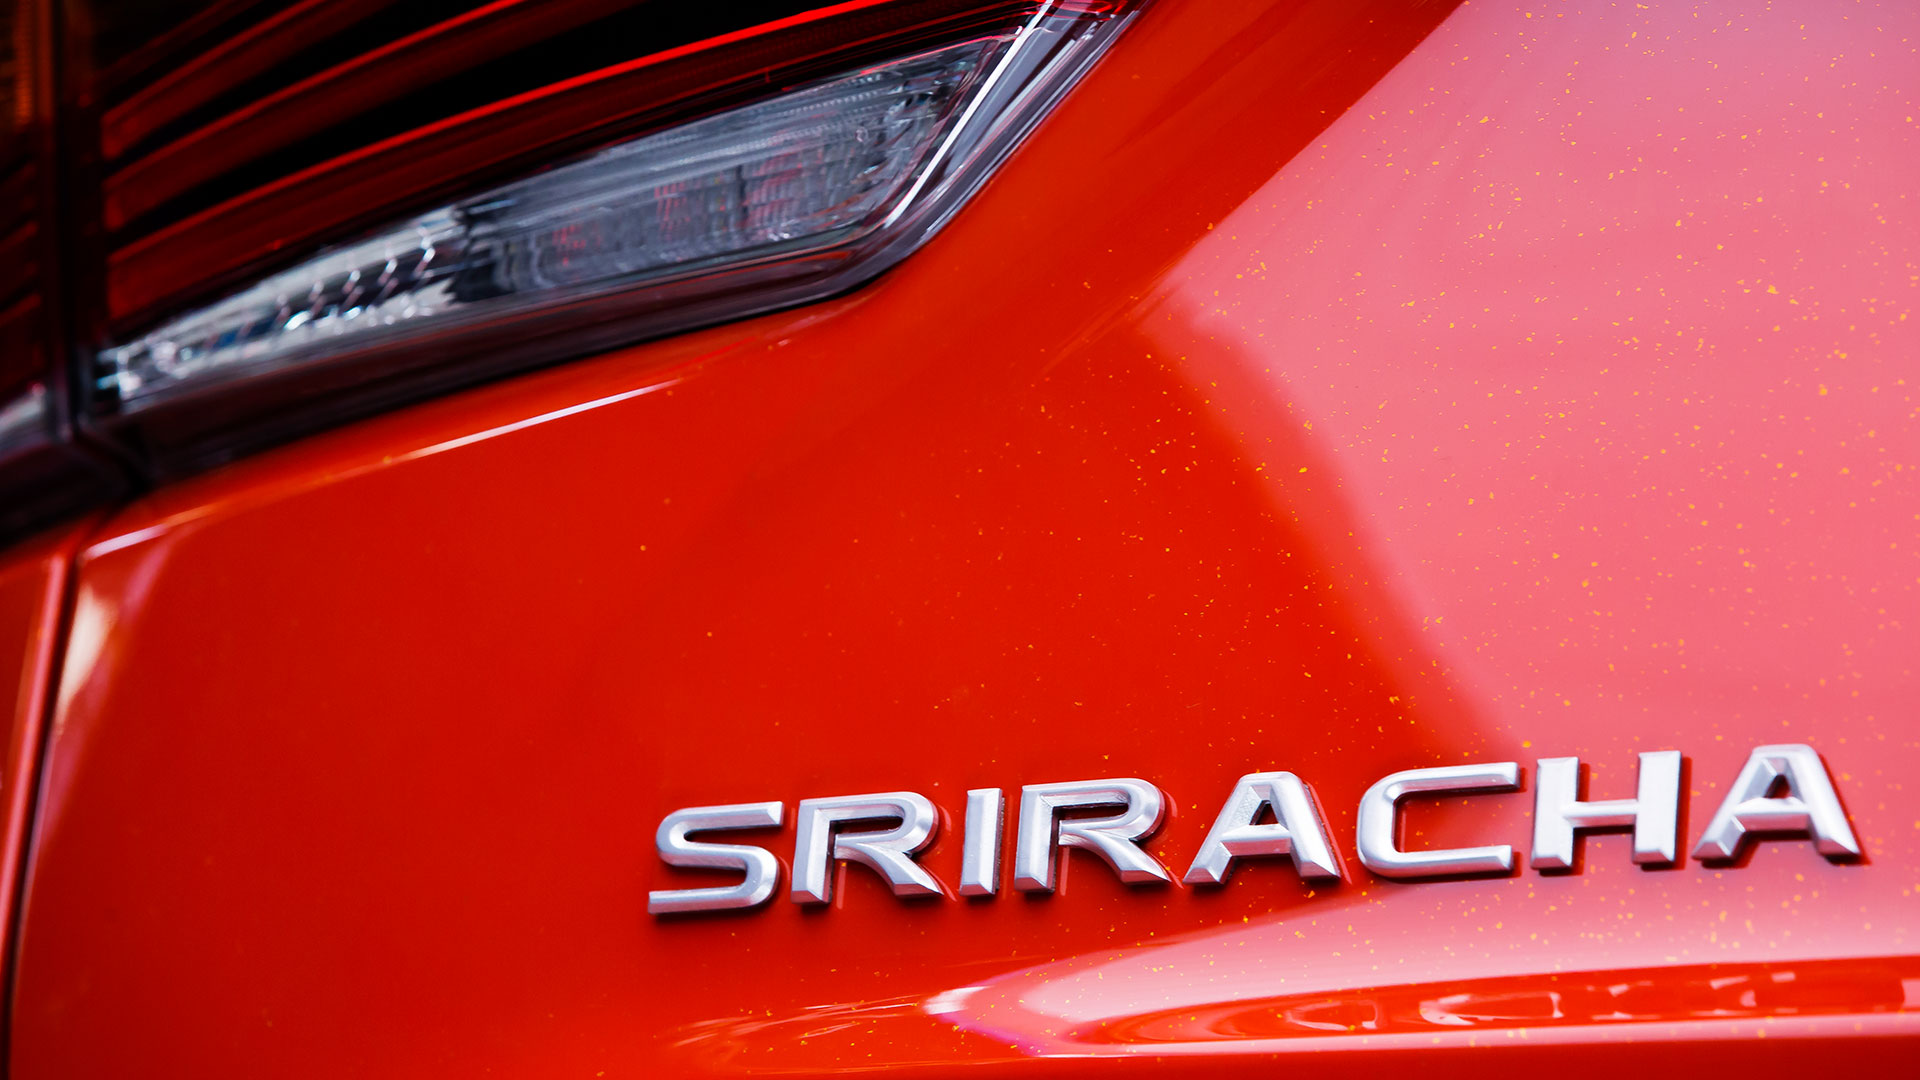 Lexus Just Made a Sriracha Car, and No This Isn't an April Fools' Joke – Adweek